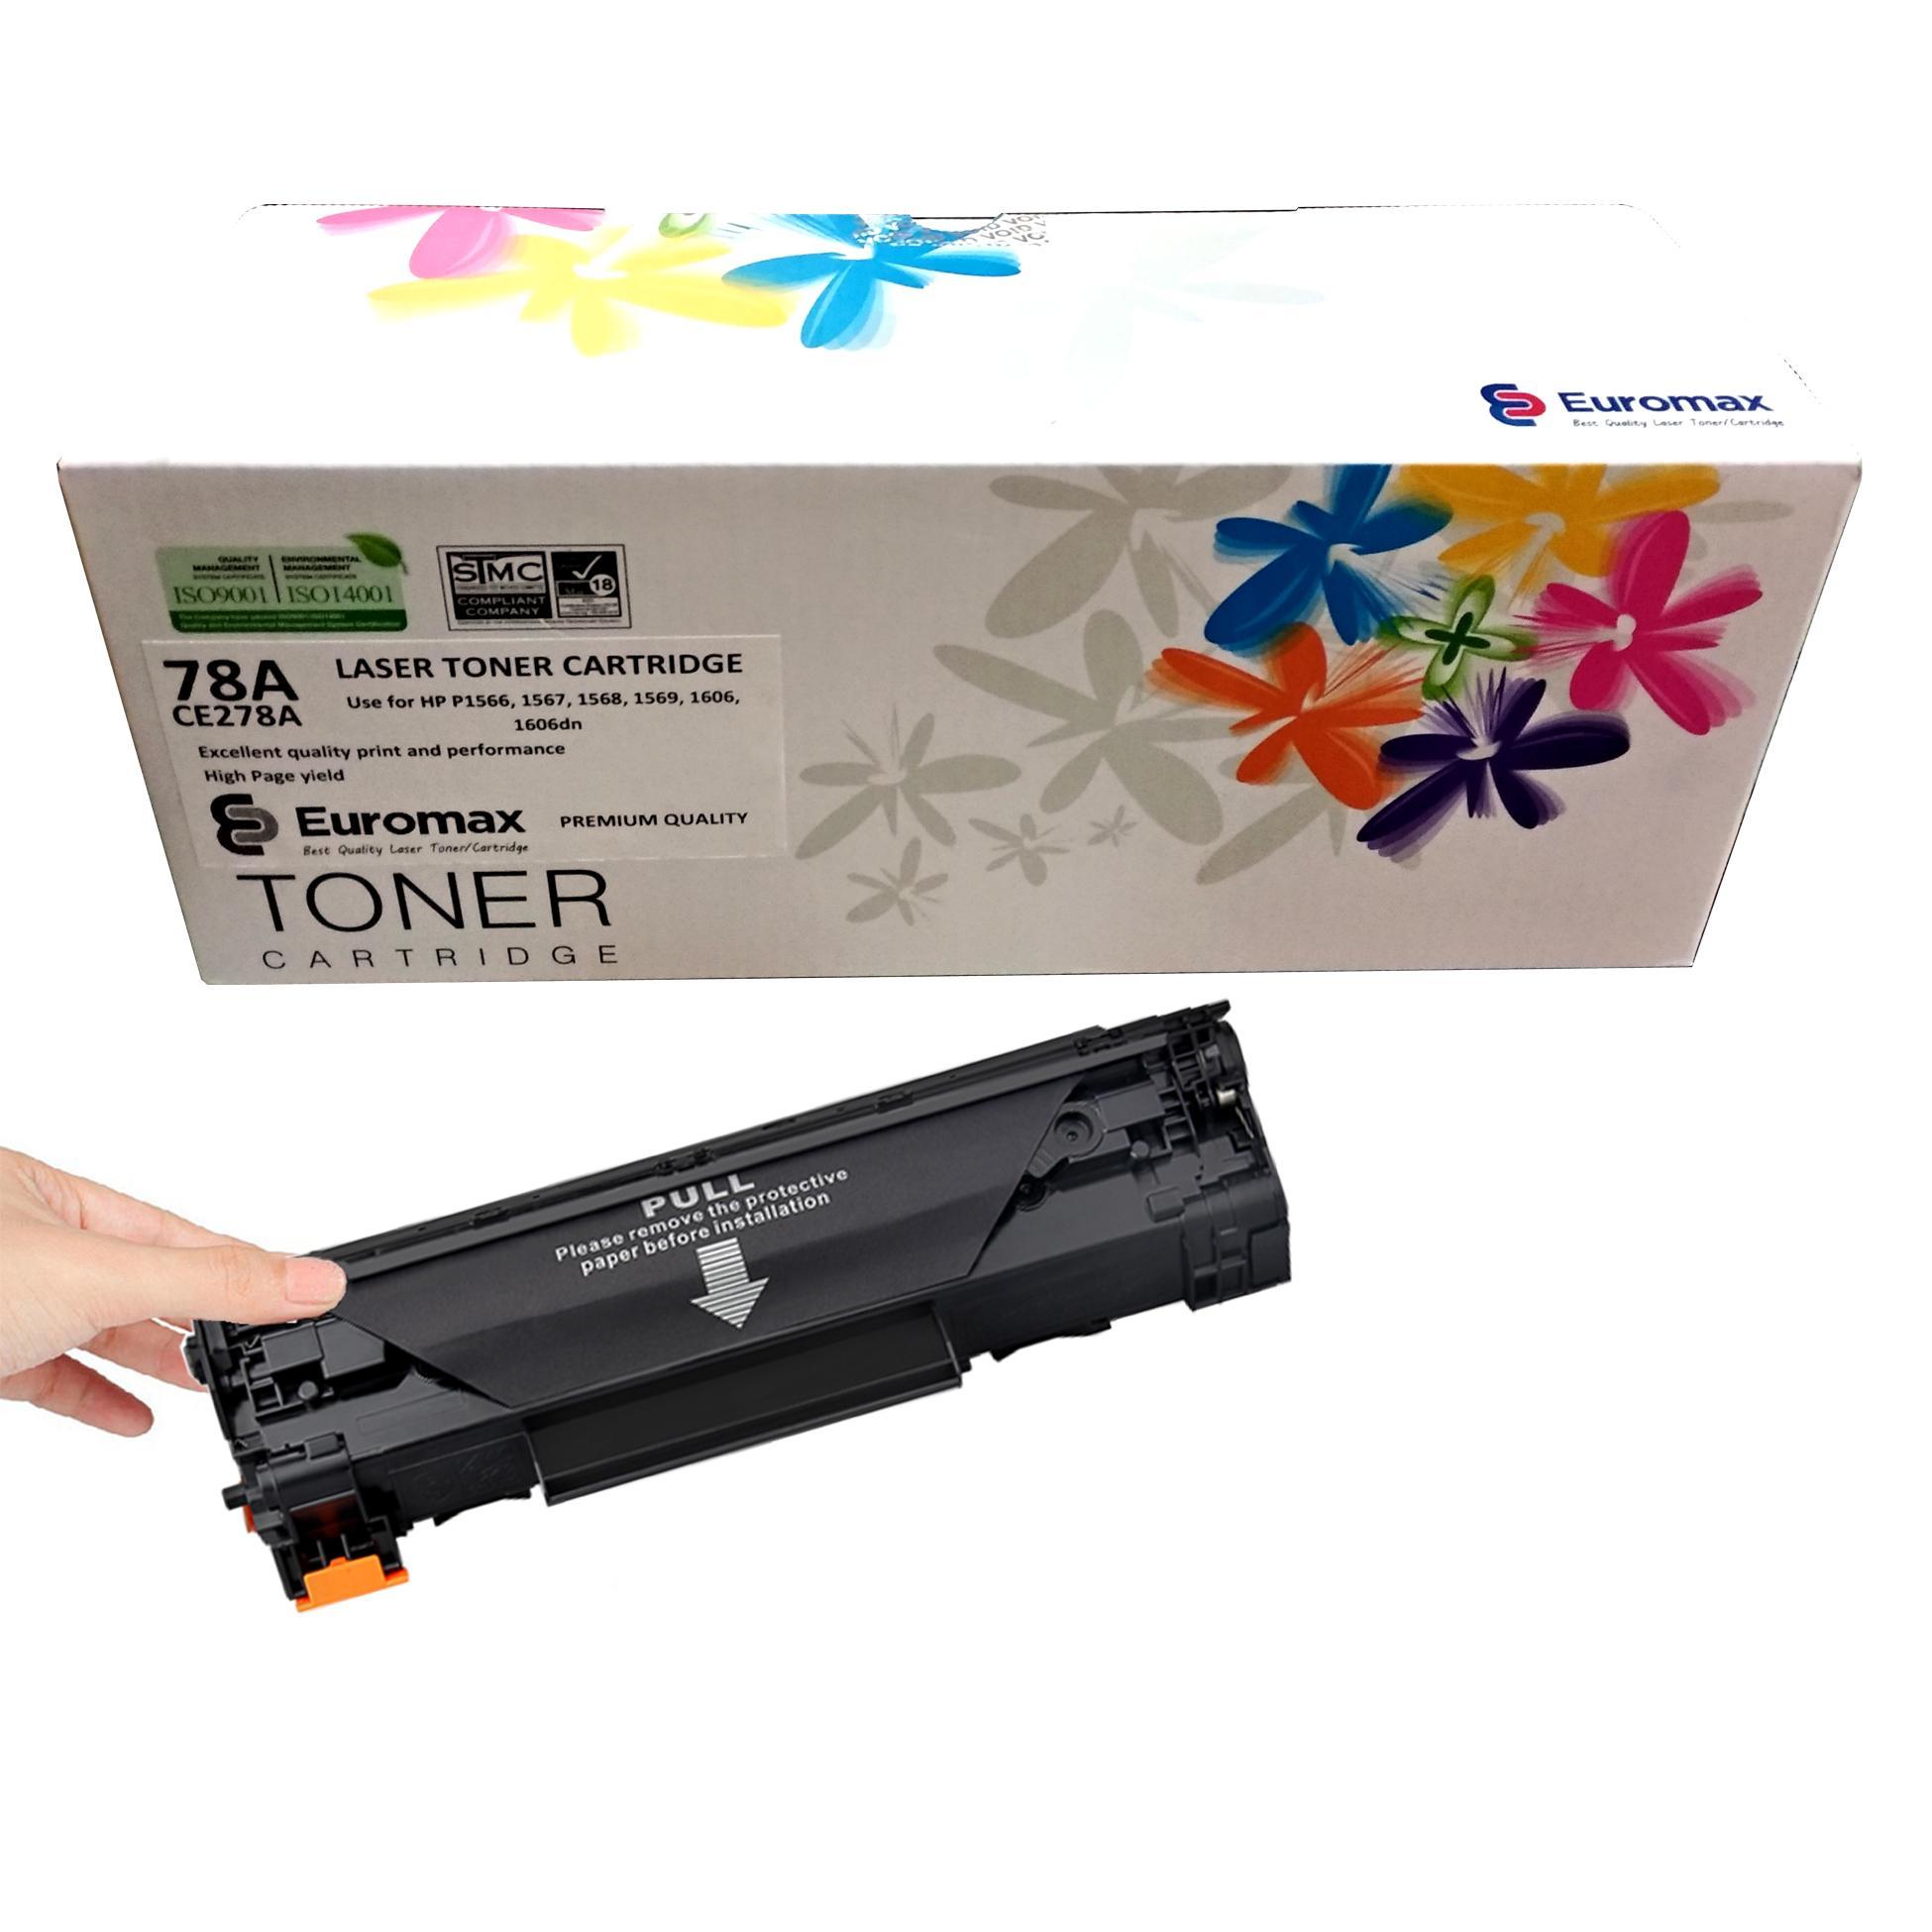 Ink Cartridges Toners Online In Bangladesh Canon Pg 47 Original 78a Ce278a Compatible Laser Toner